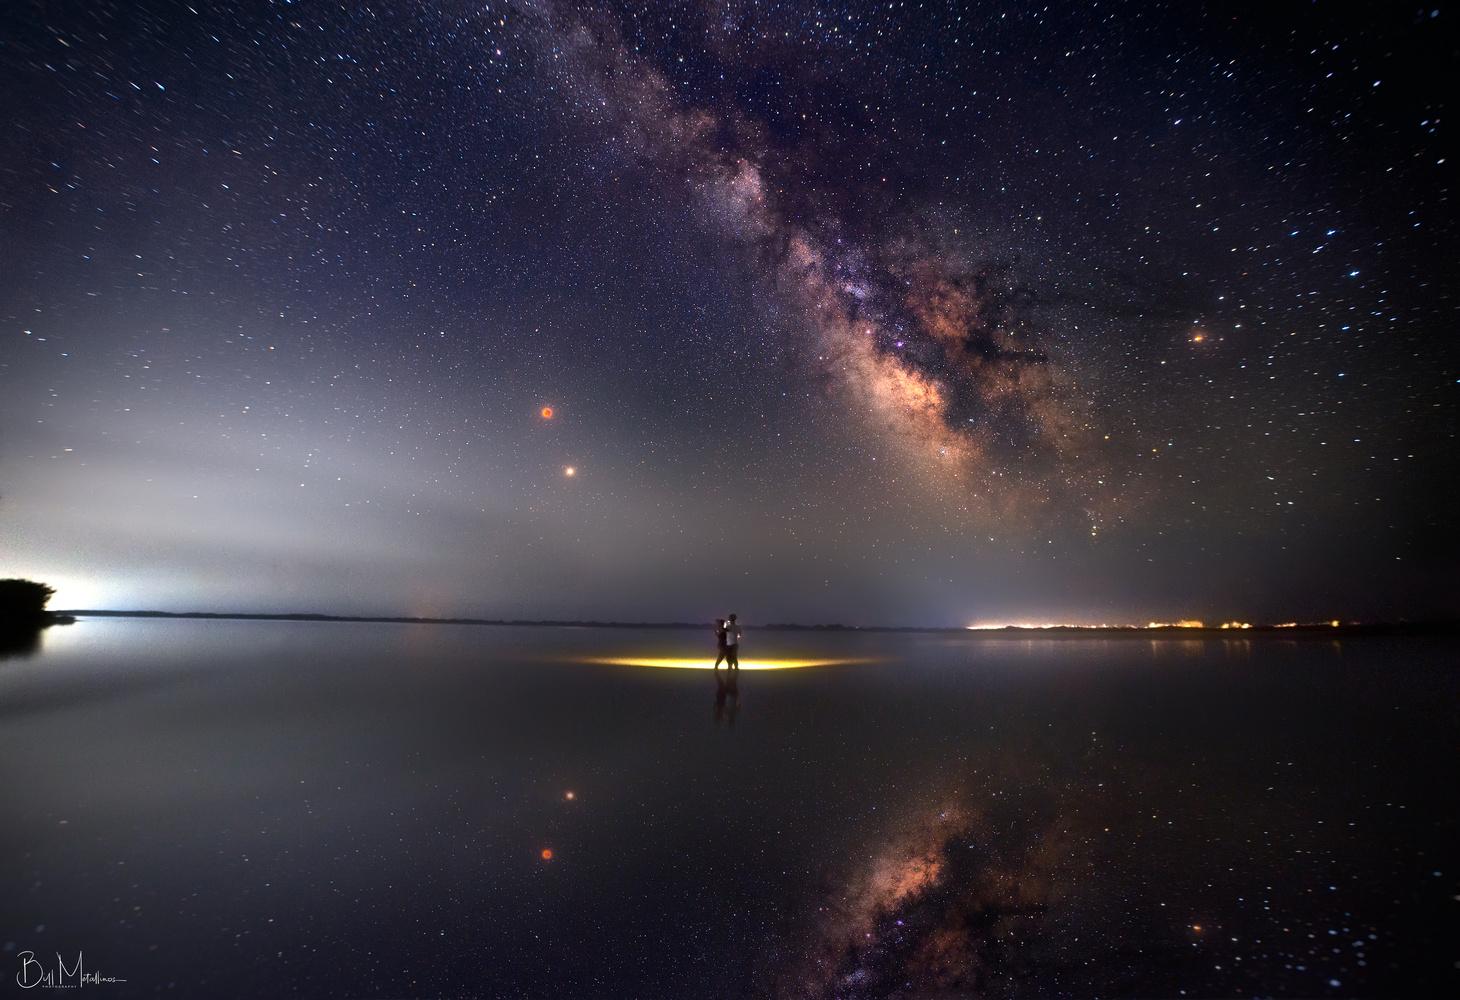 Dancing under the Total Lunar Eclipse by Bill Metallinos